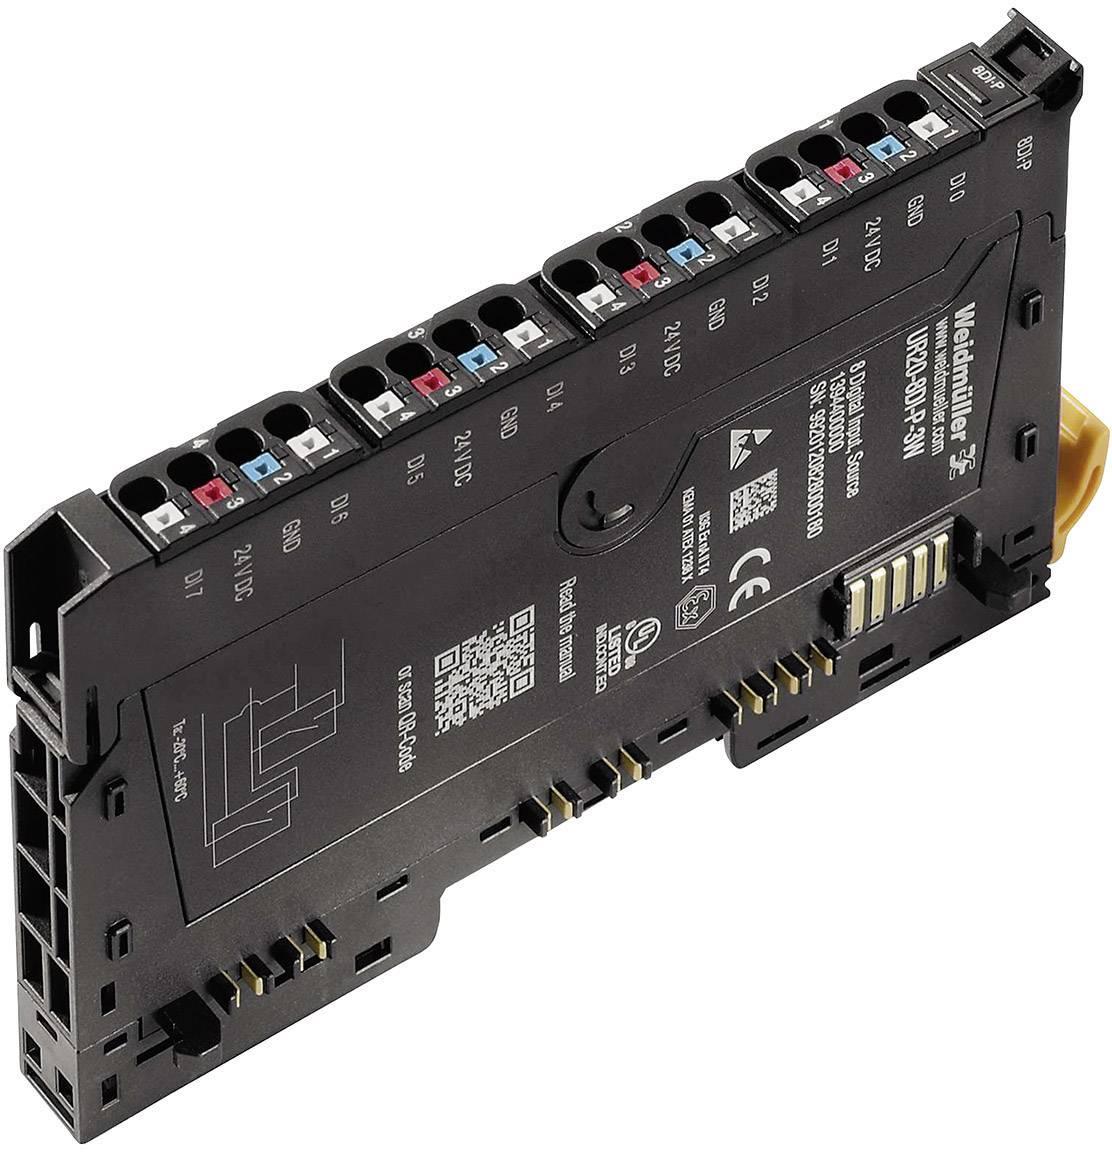 Rozšiřující modul pro PLC Weidmüller UR20-8DI-P-3W, 1394400000